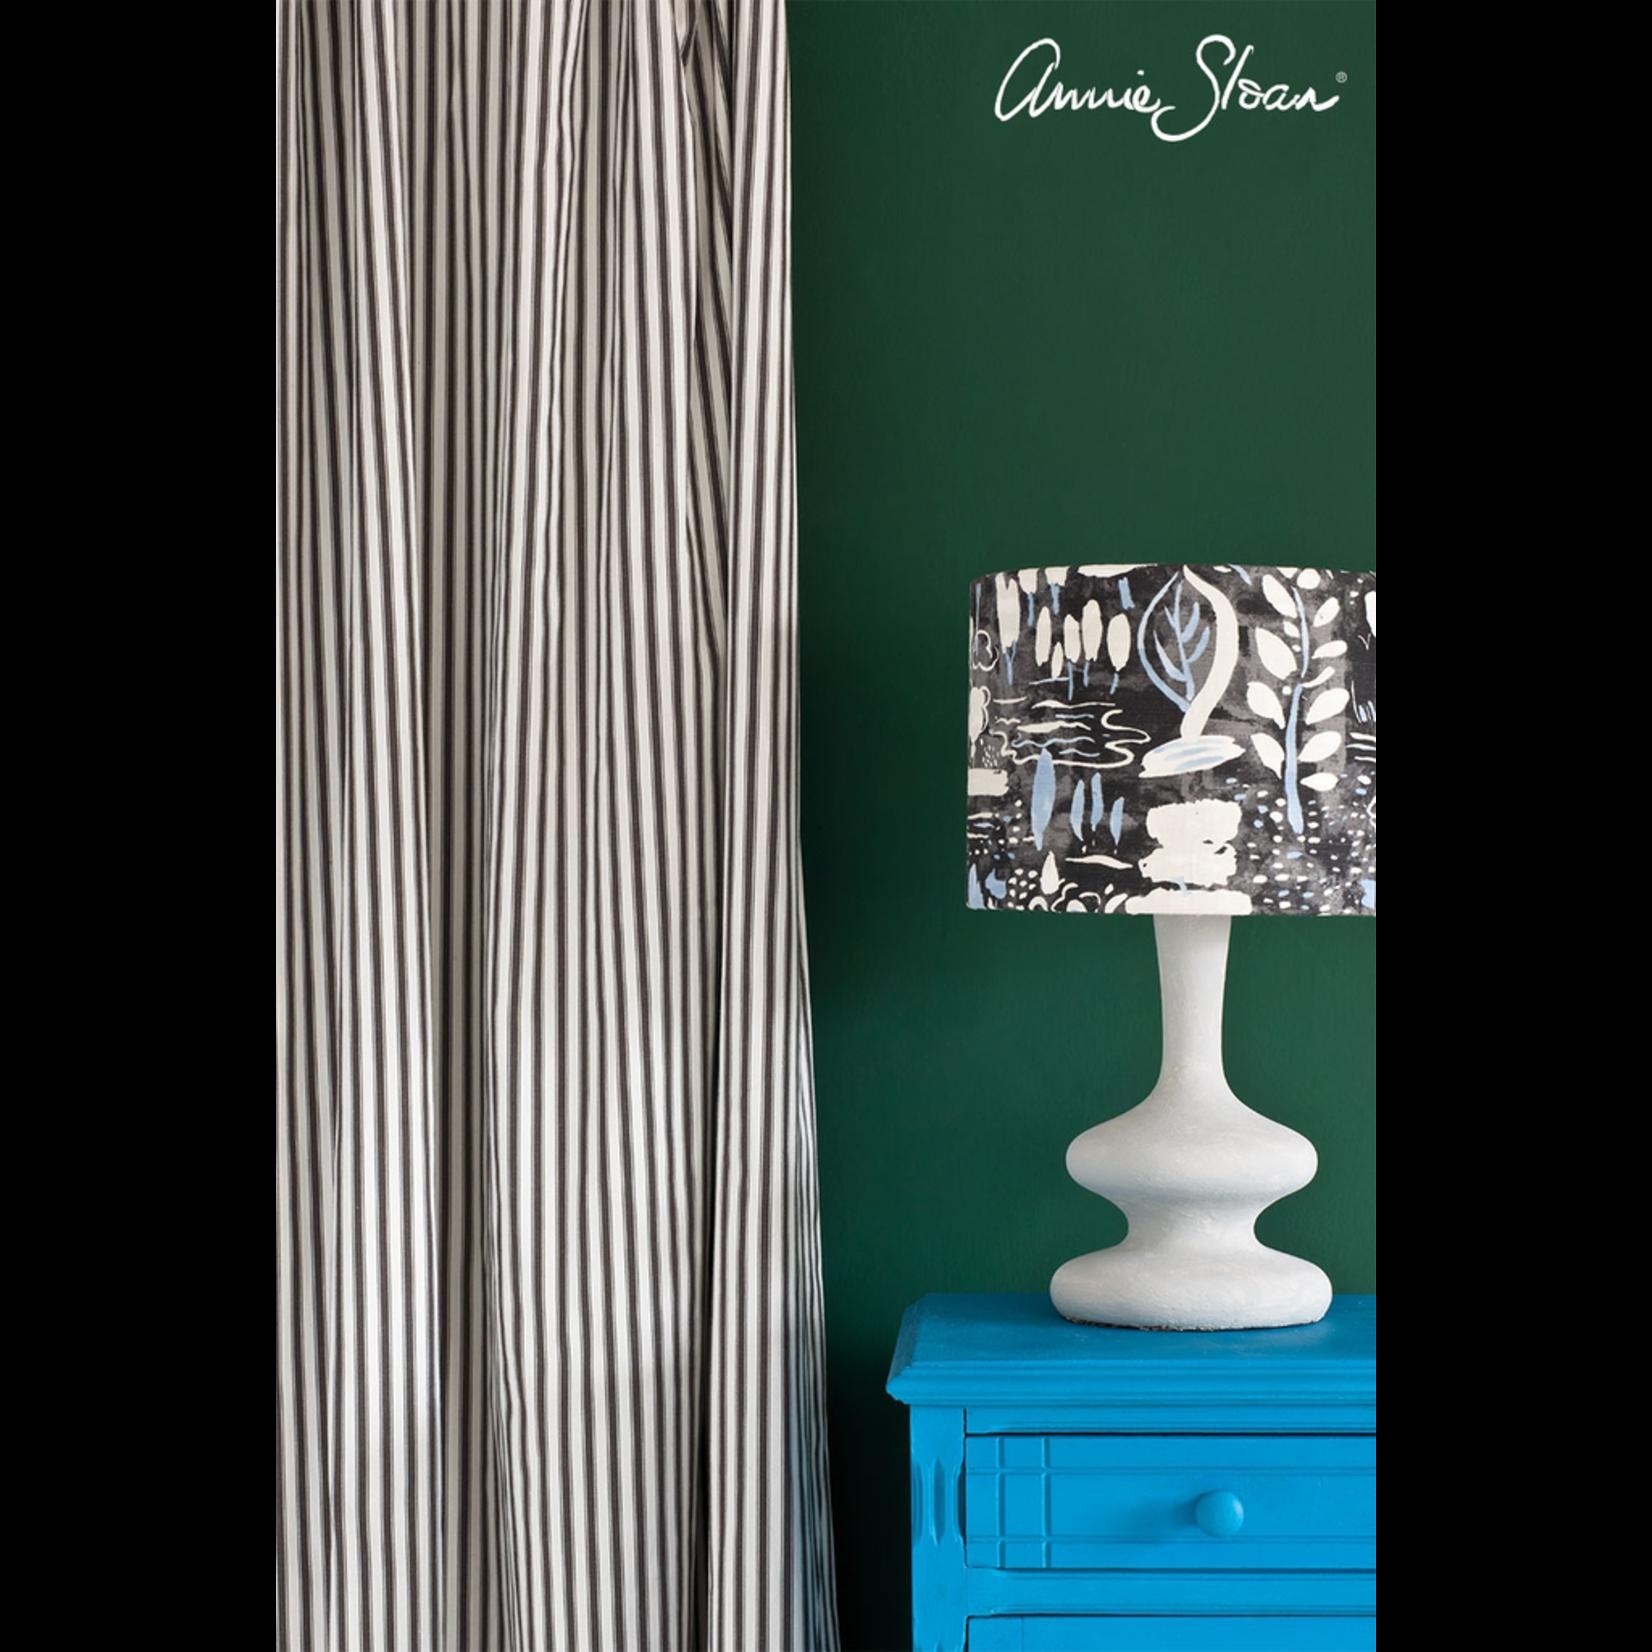 Annie Sloan Annie Sloan Giverny Chalk Paint